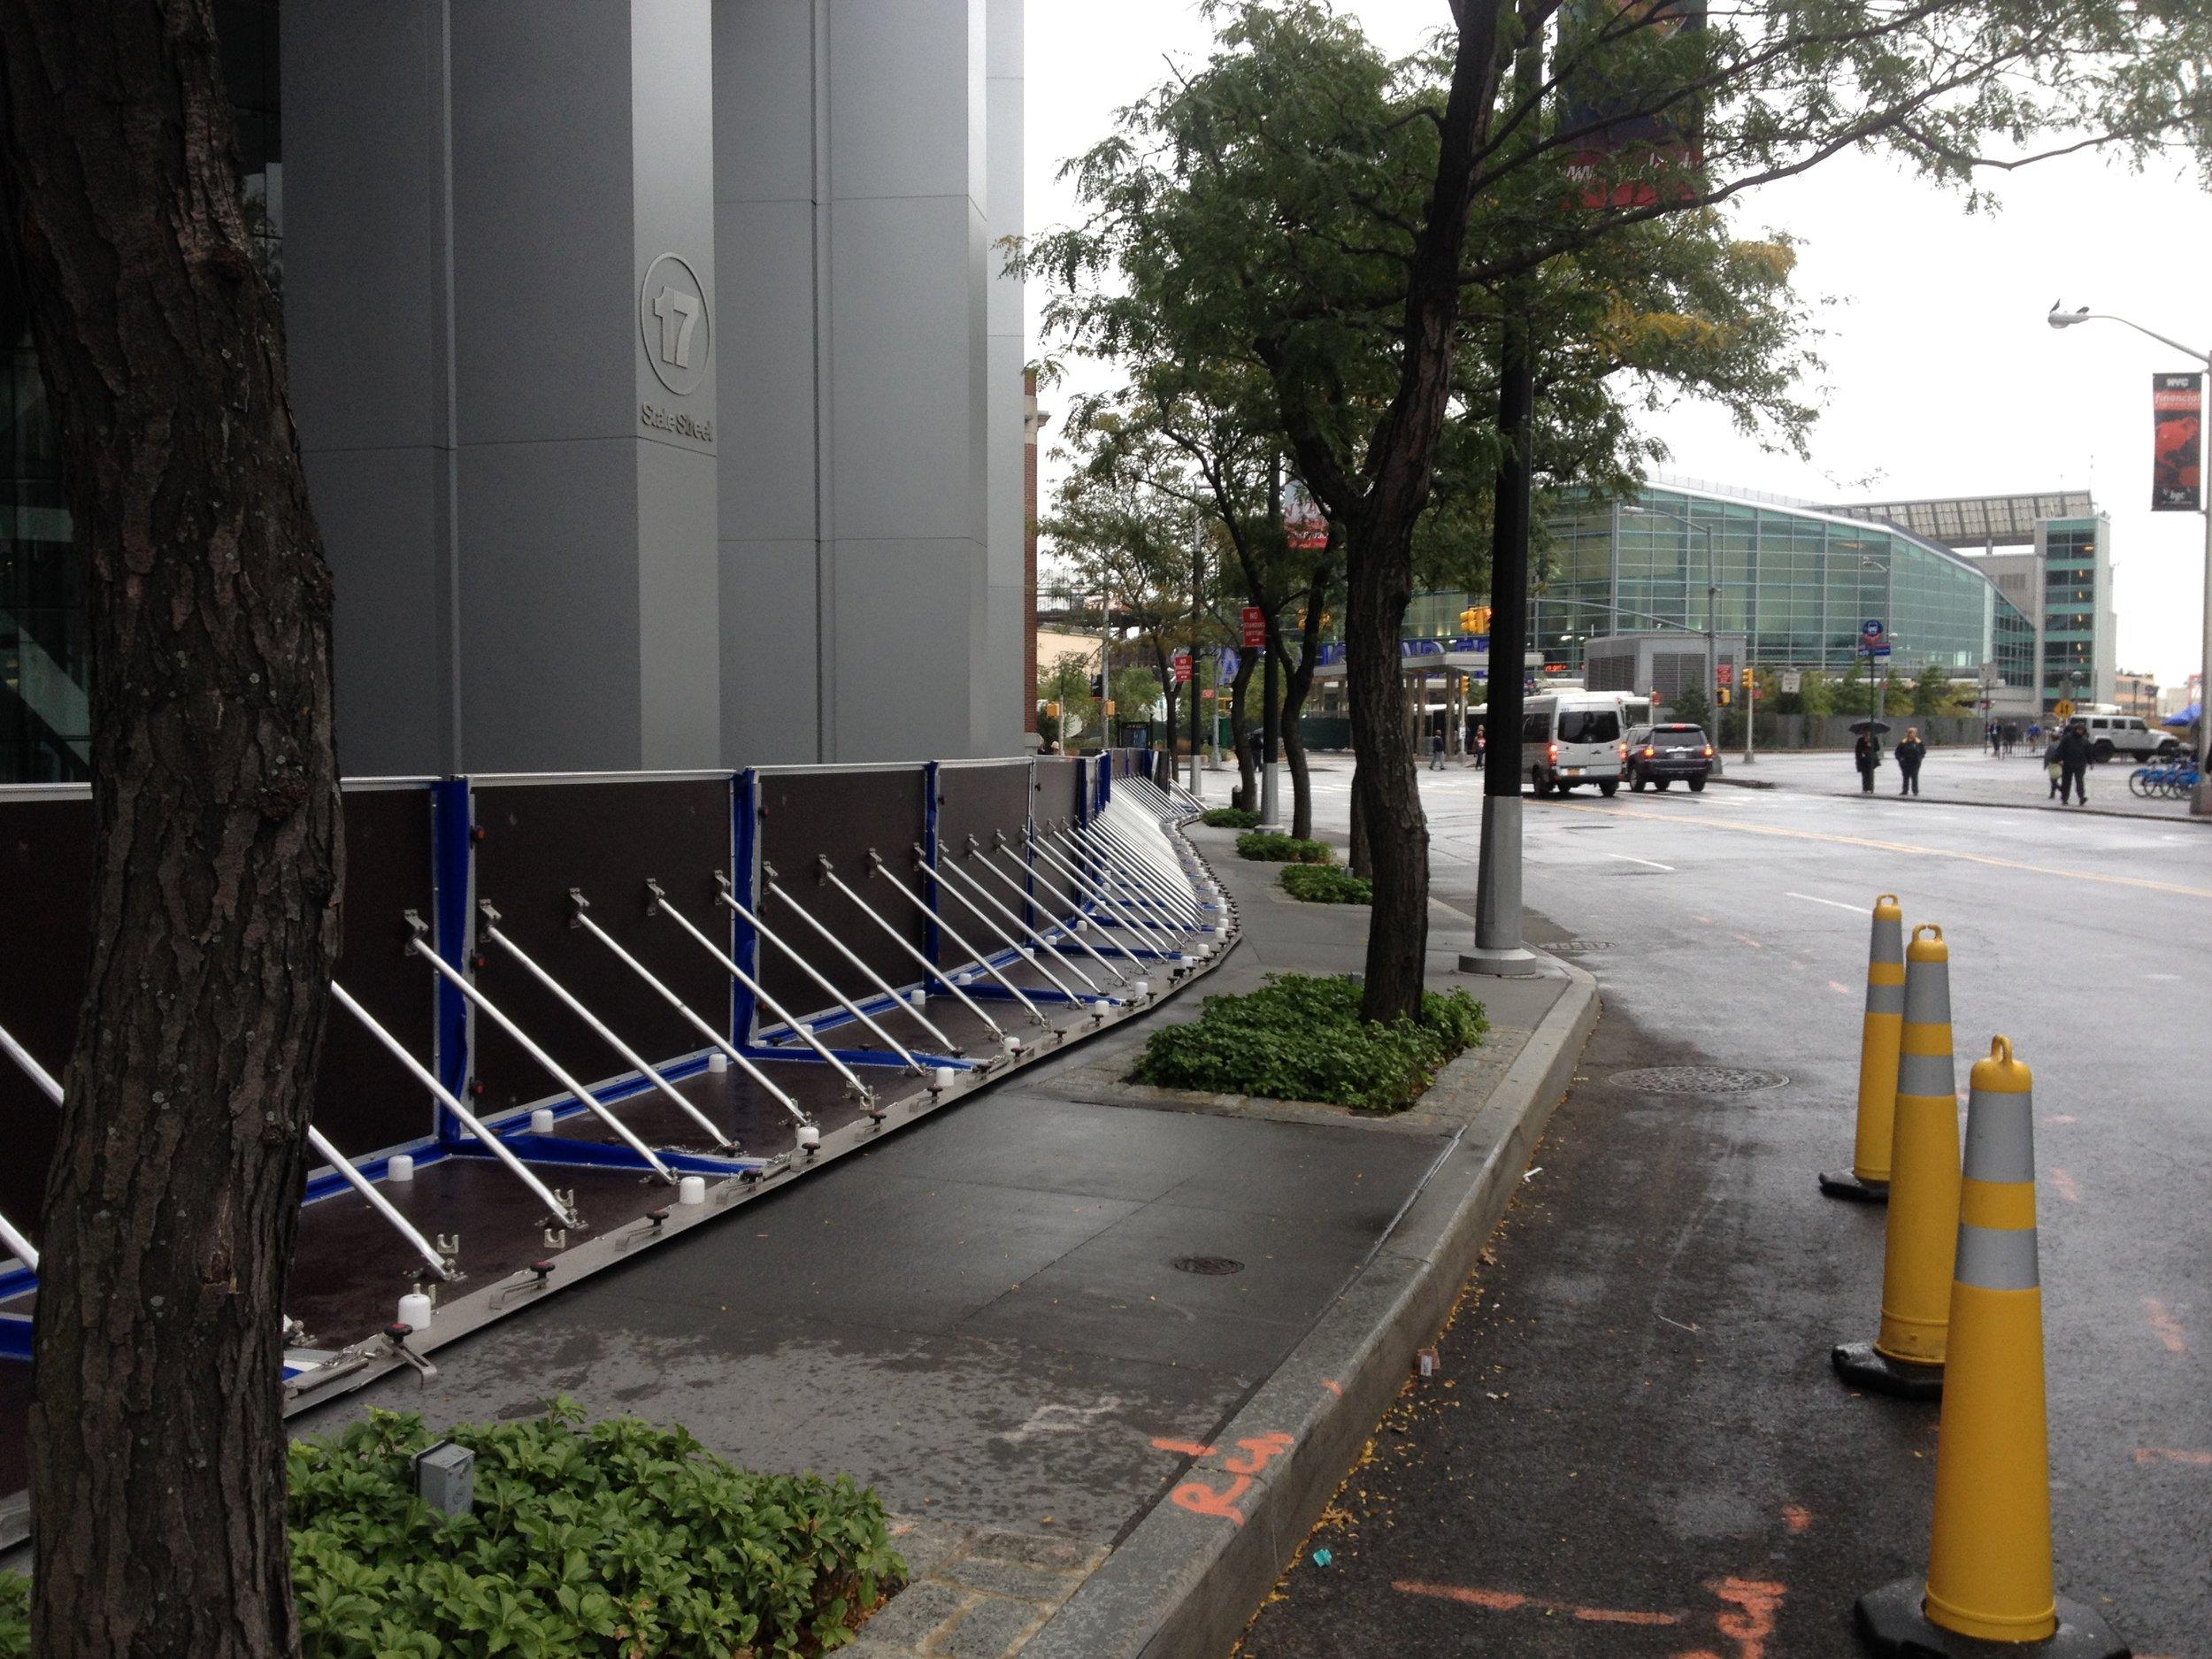 展開可能な洪水防止装置   最高レベルの洪水防止装置認証取得  - 周囲 - 開口部 - 建物との結合 -